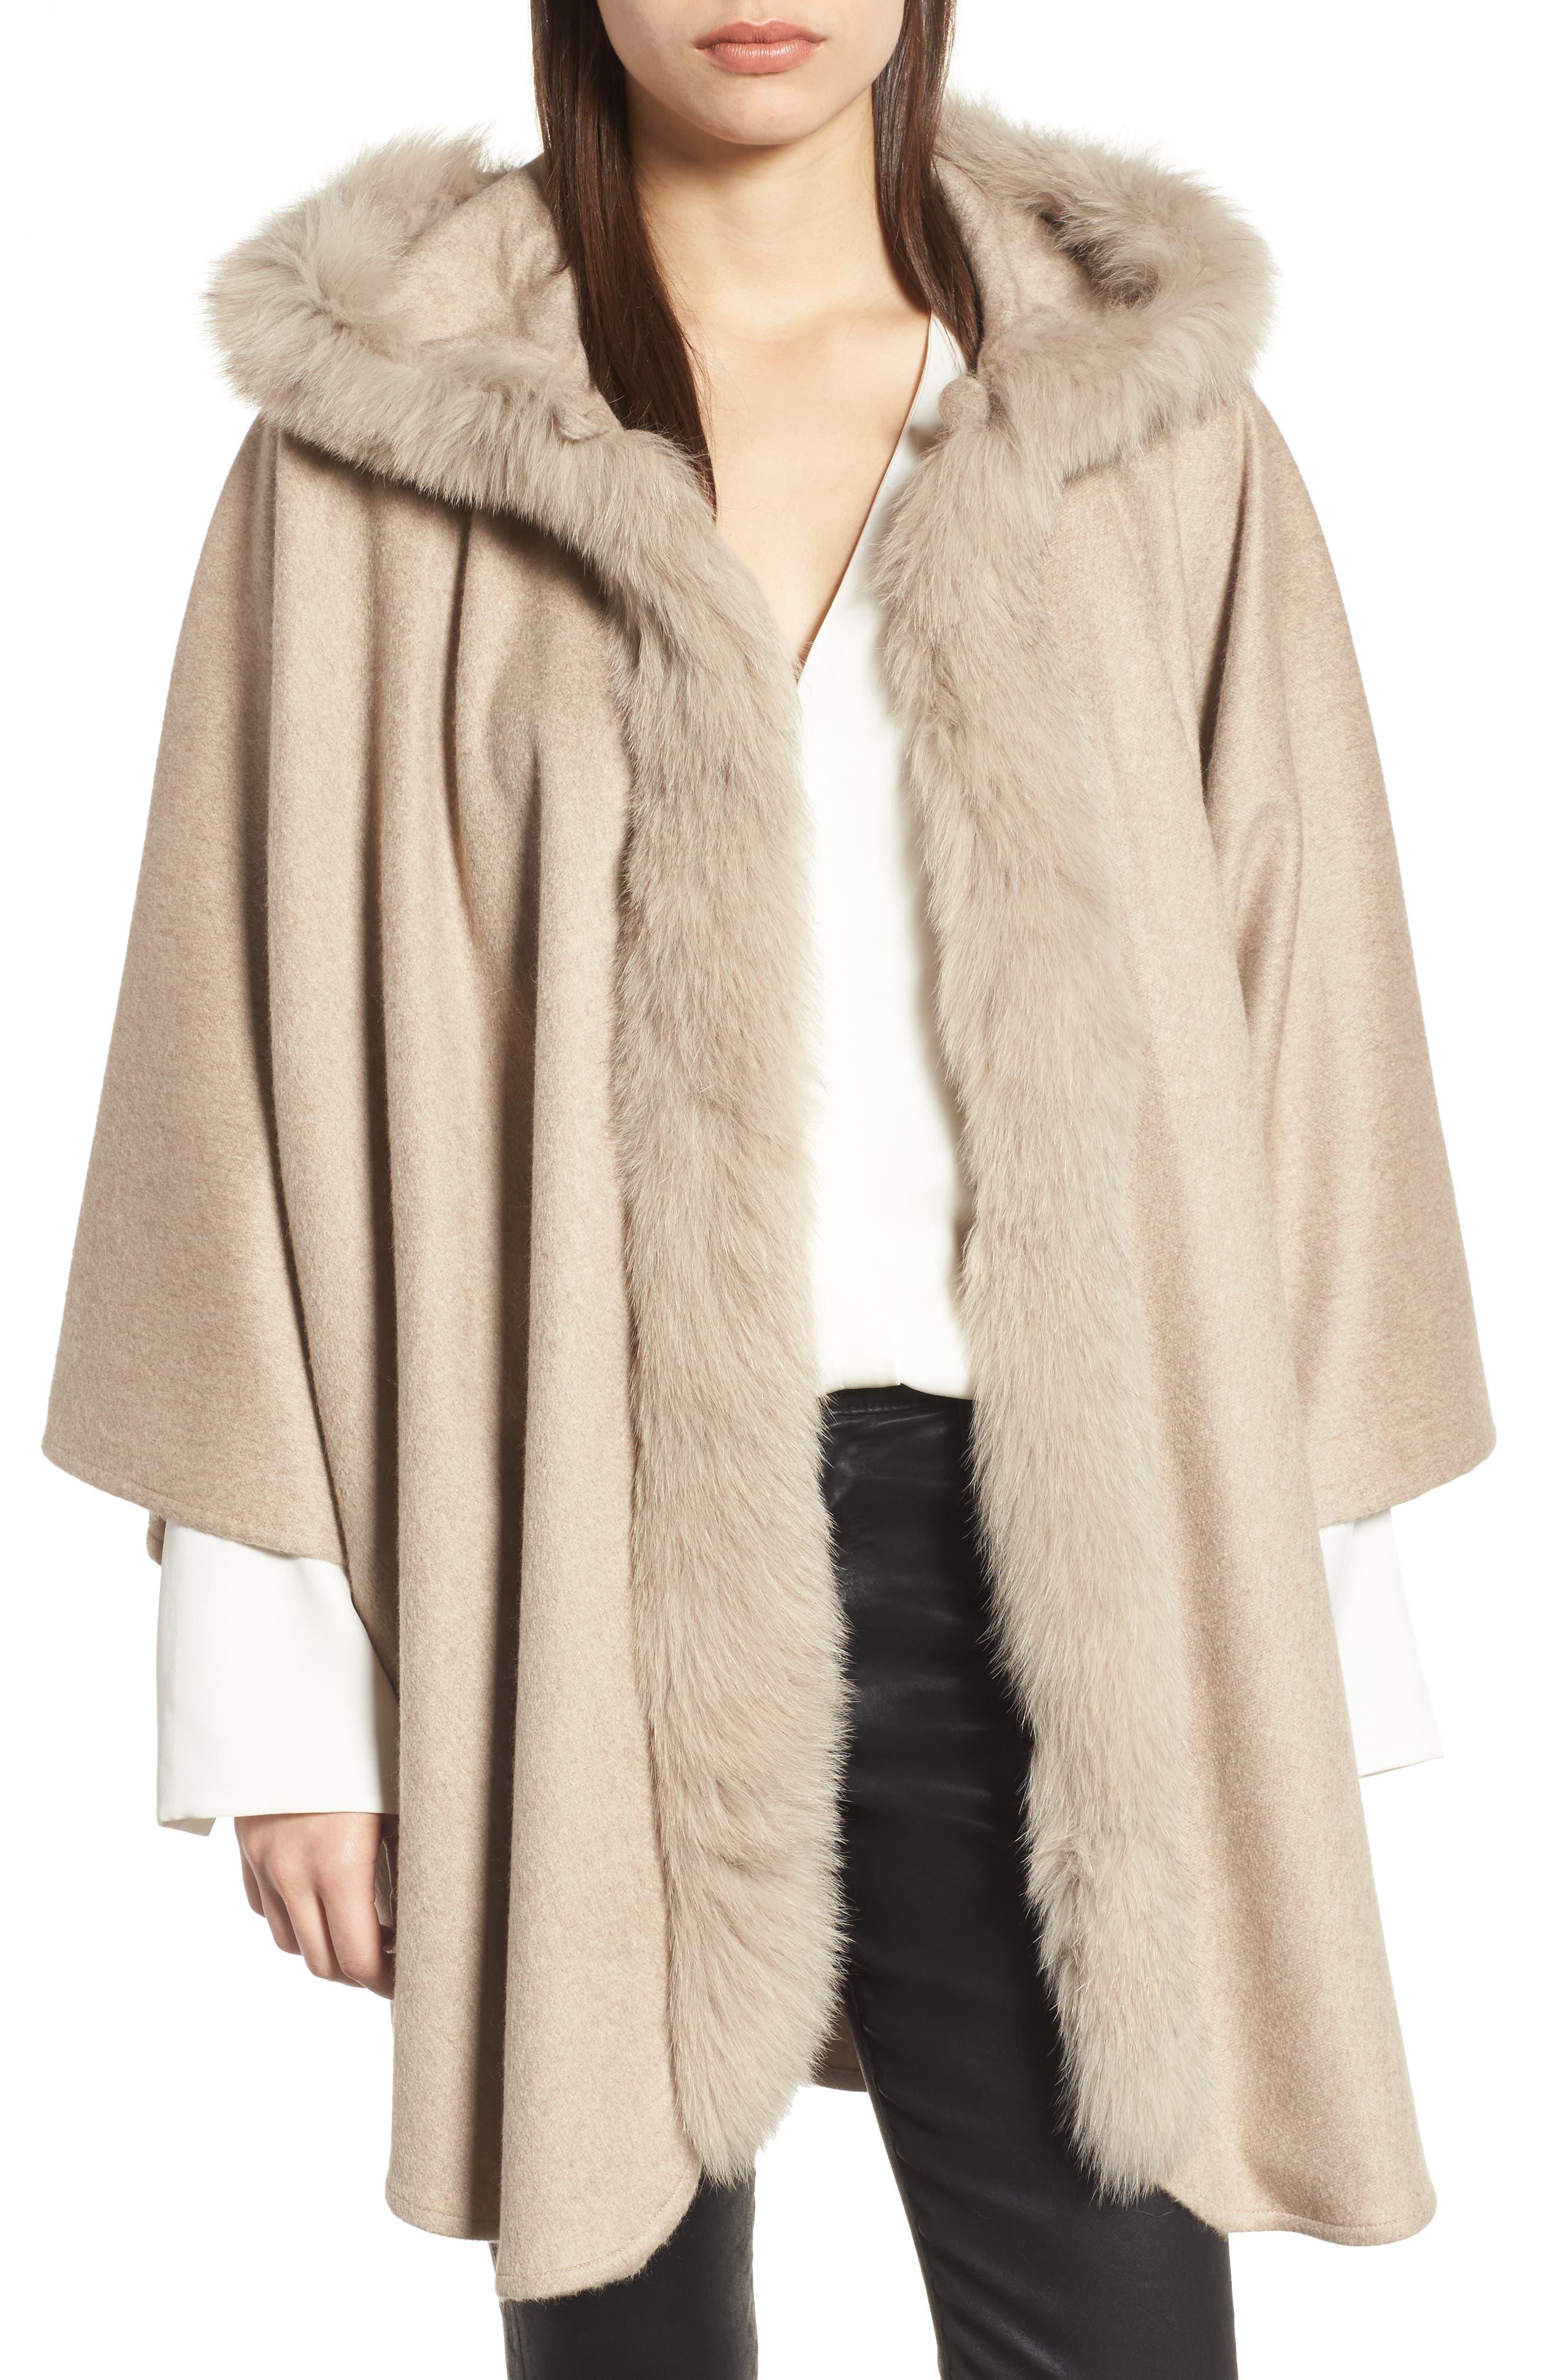 Main Image - Max Mara Cashmere Hooded Cape with Genuine Fox Fur Trim